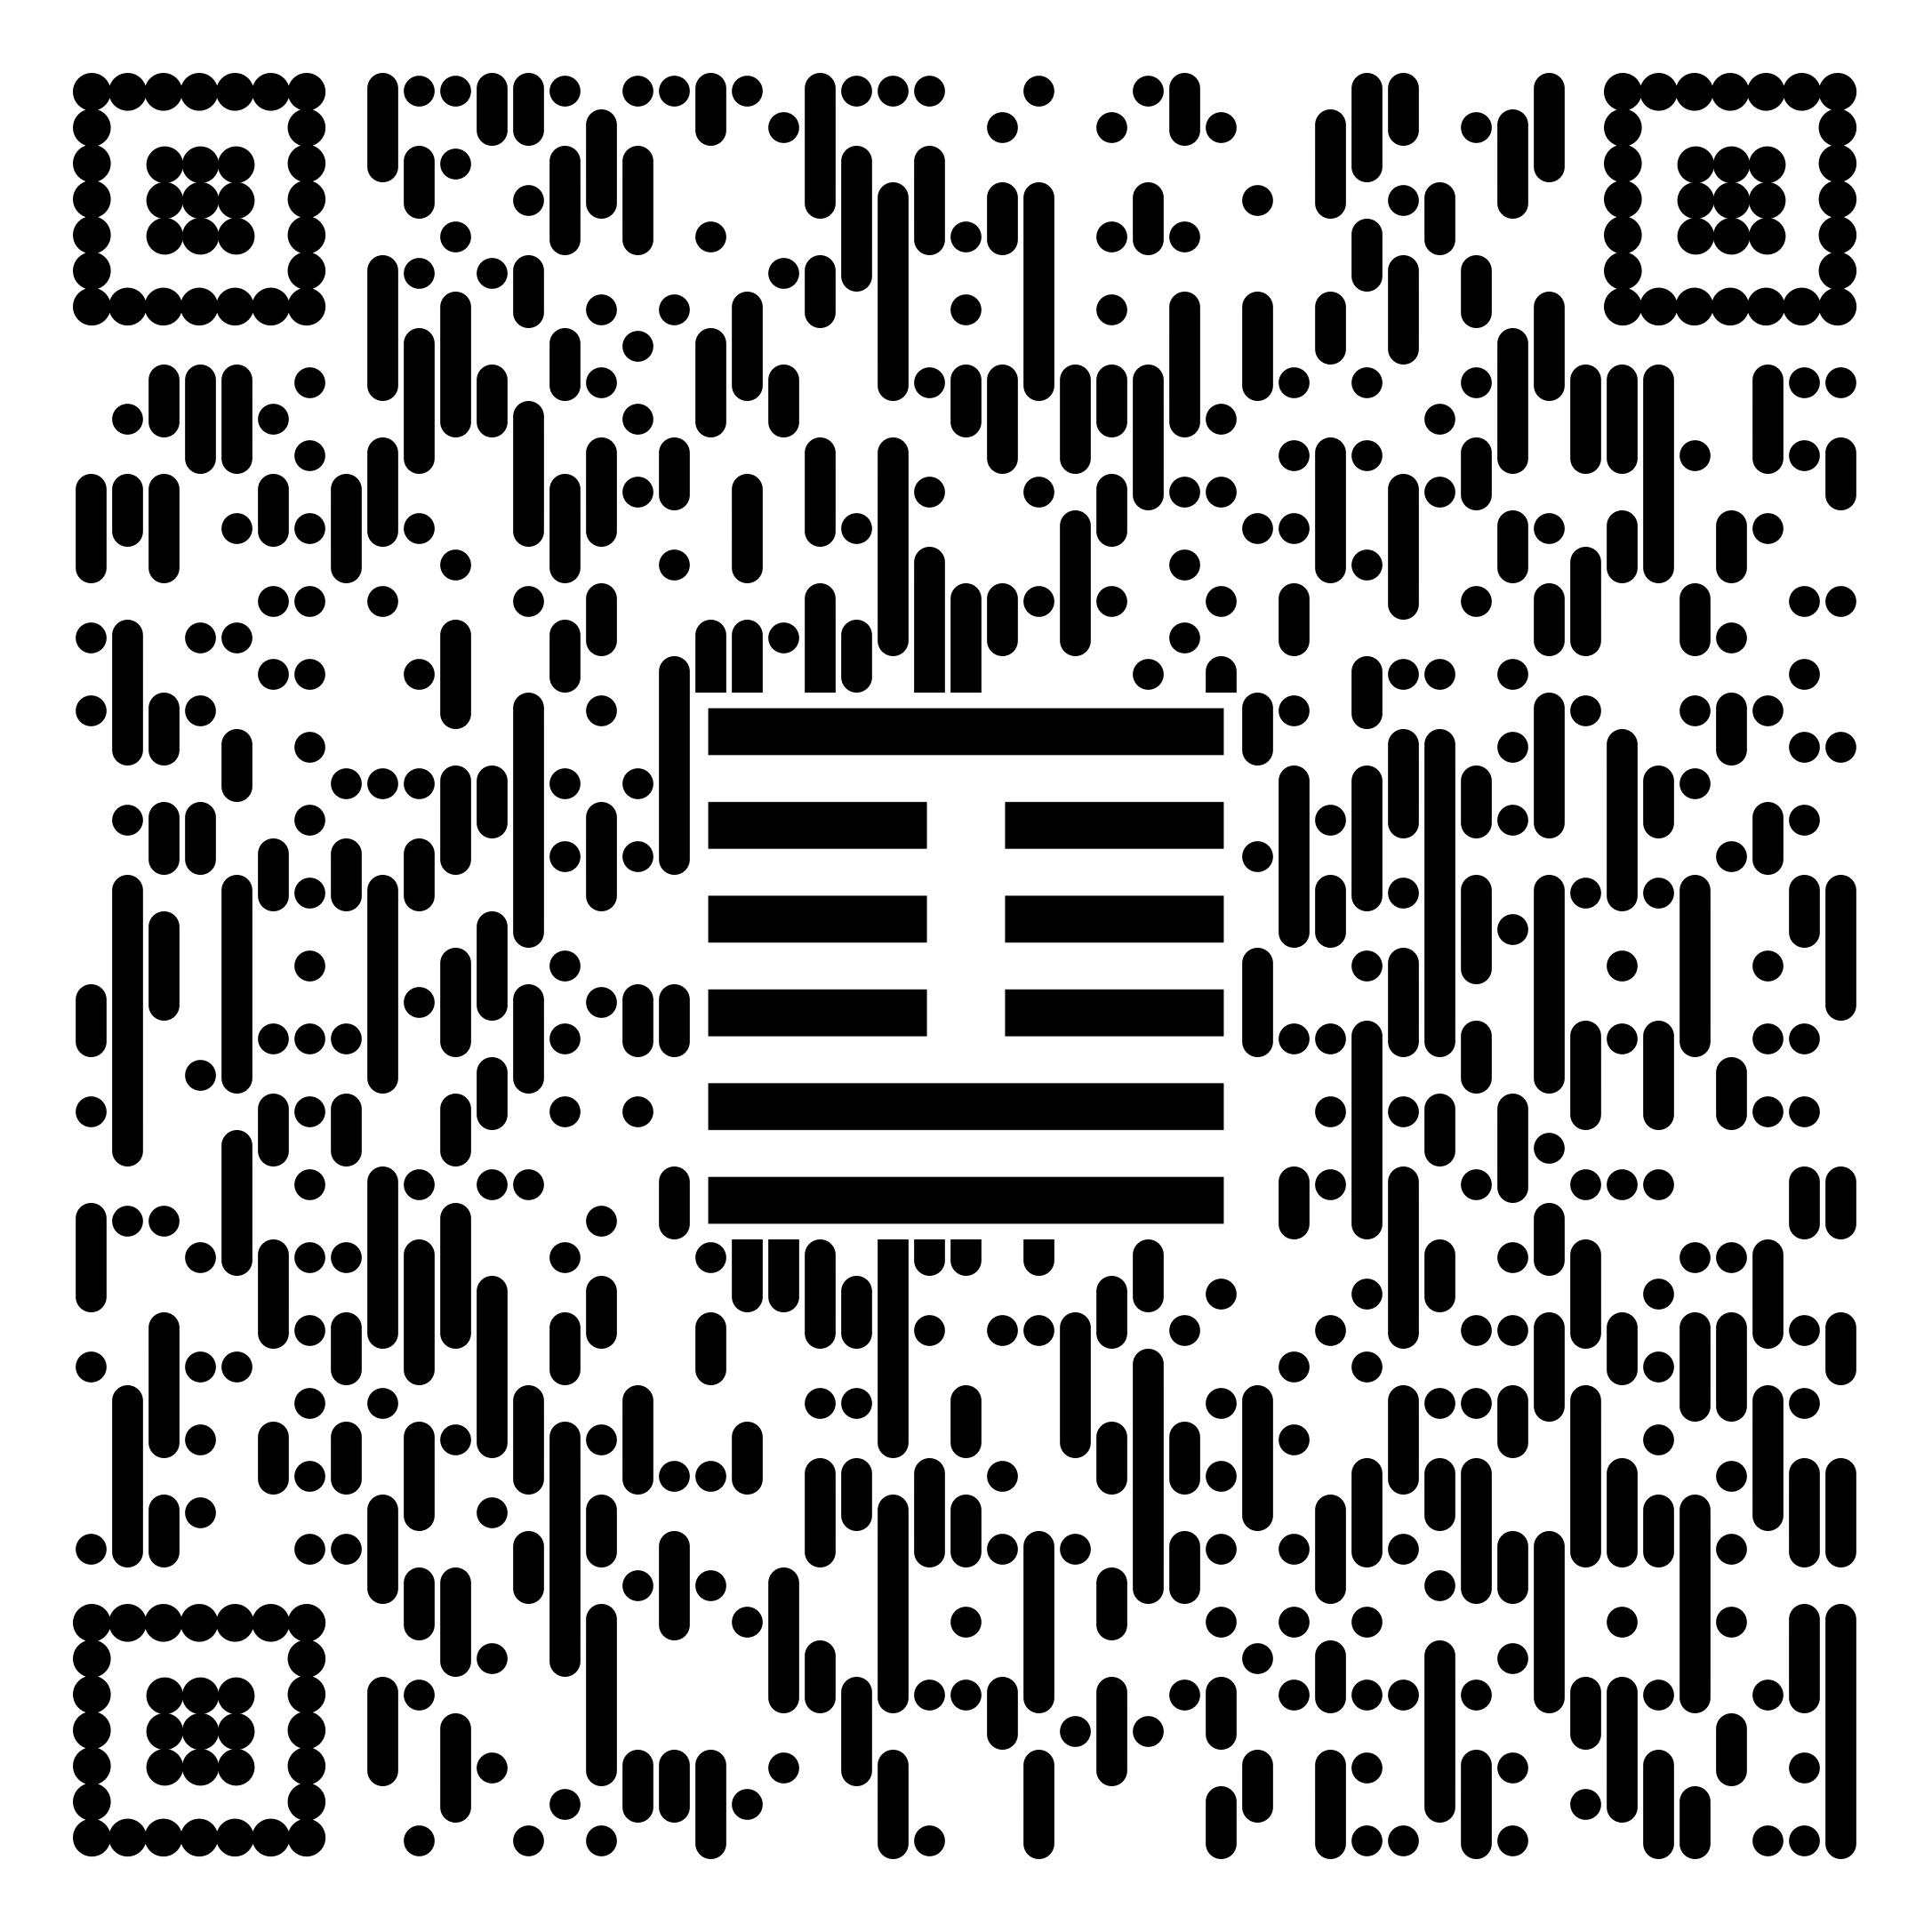 qr-code-41.png